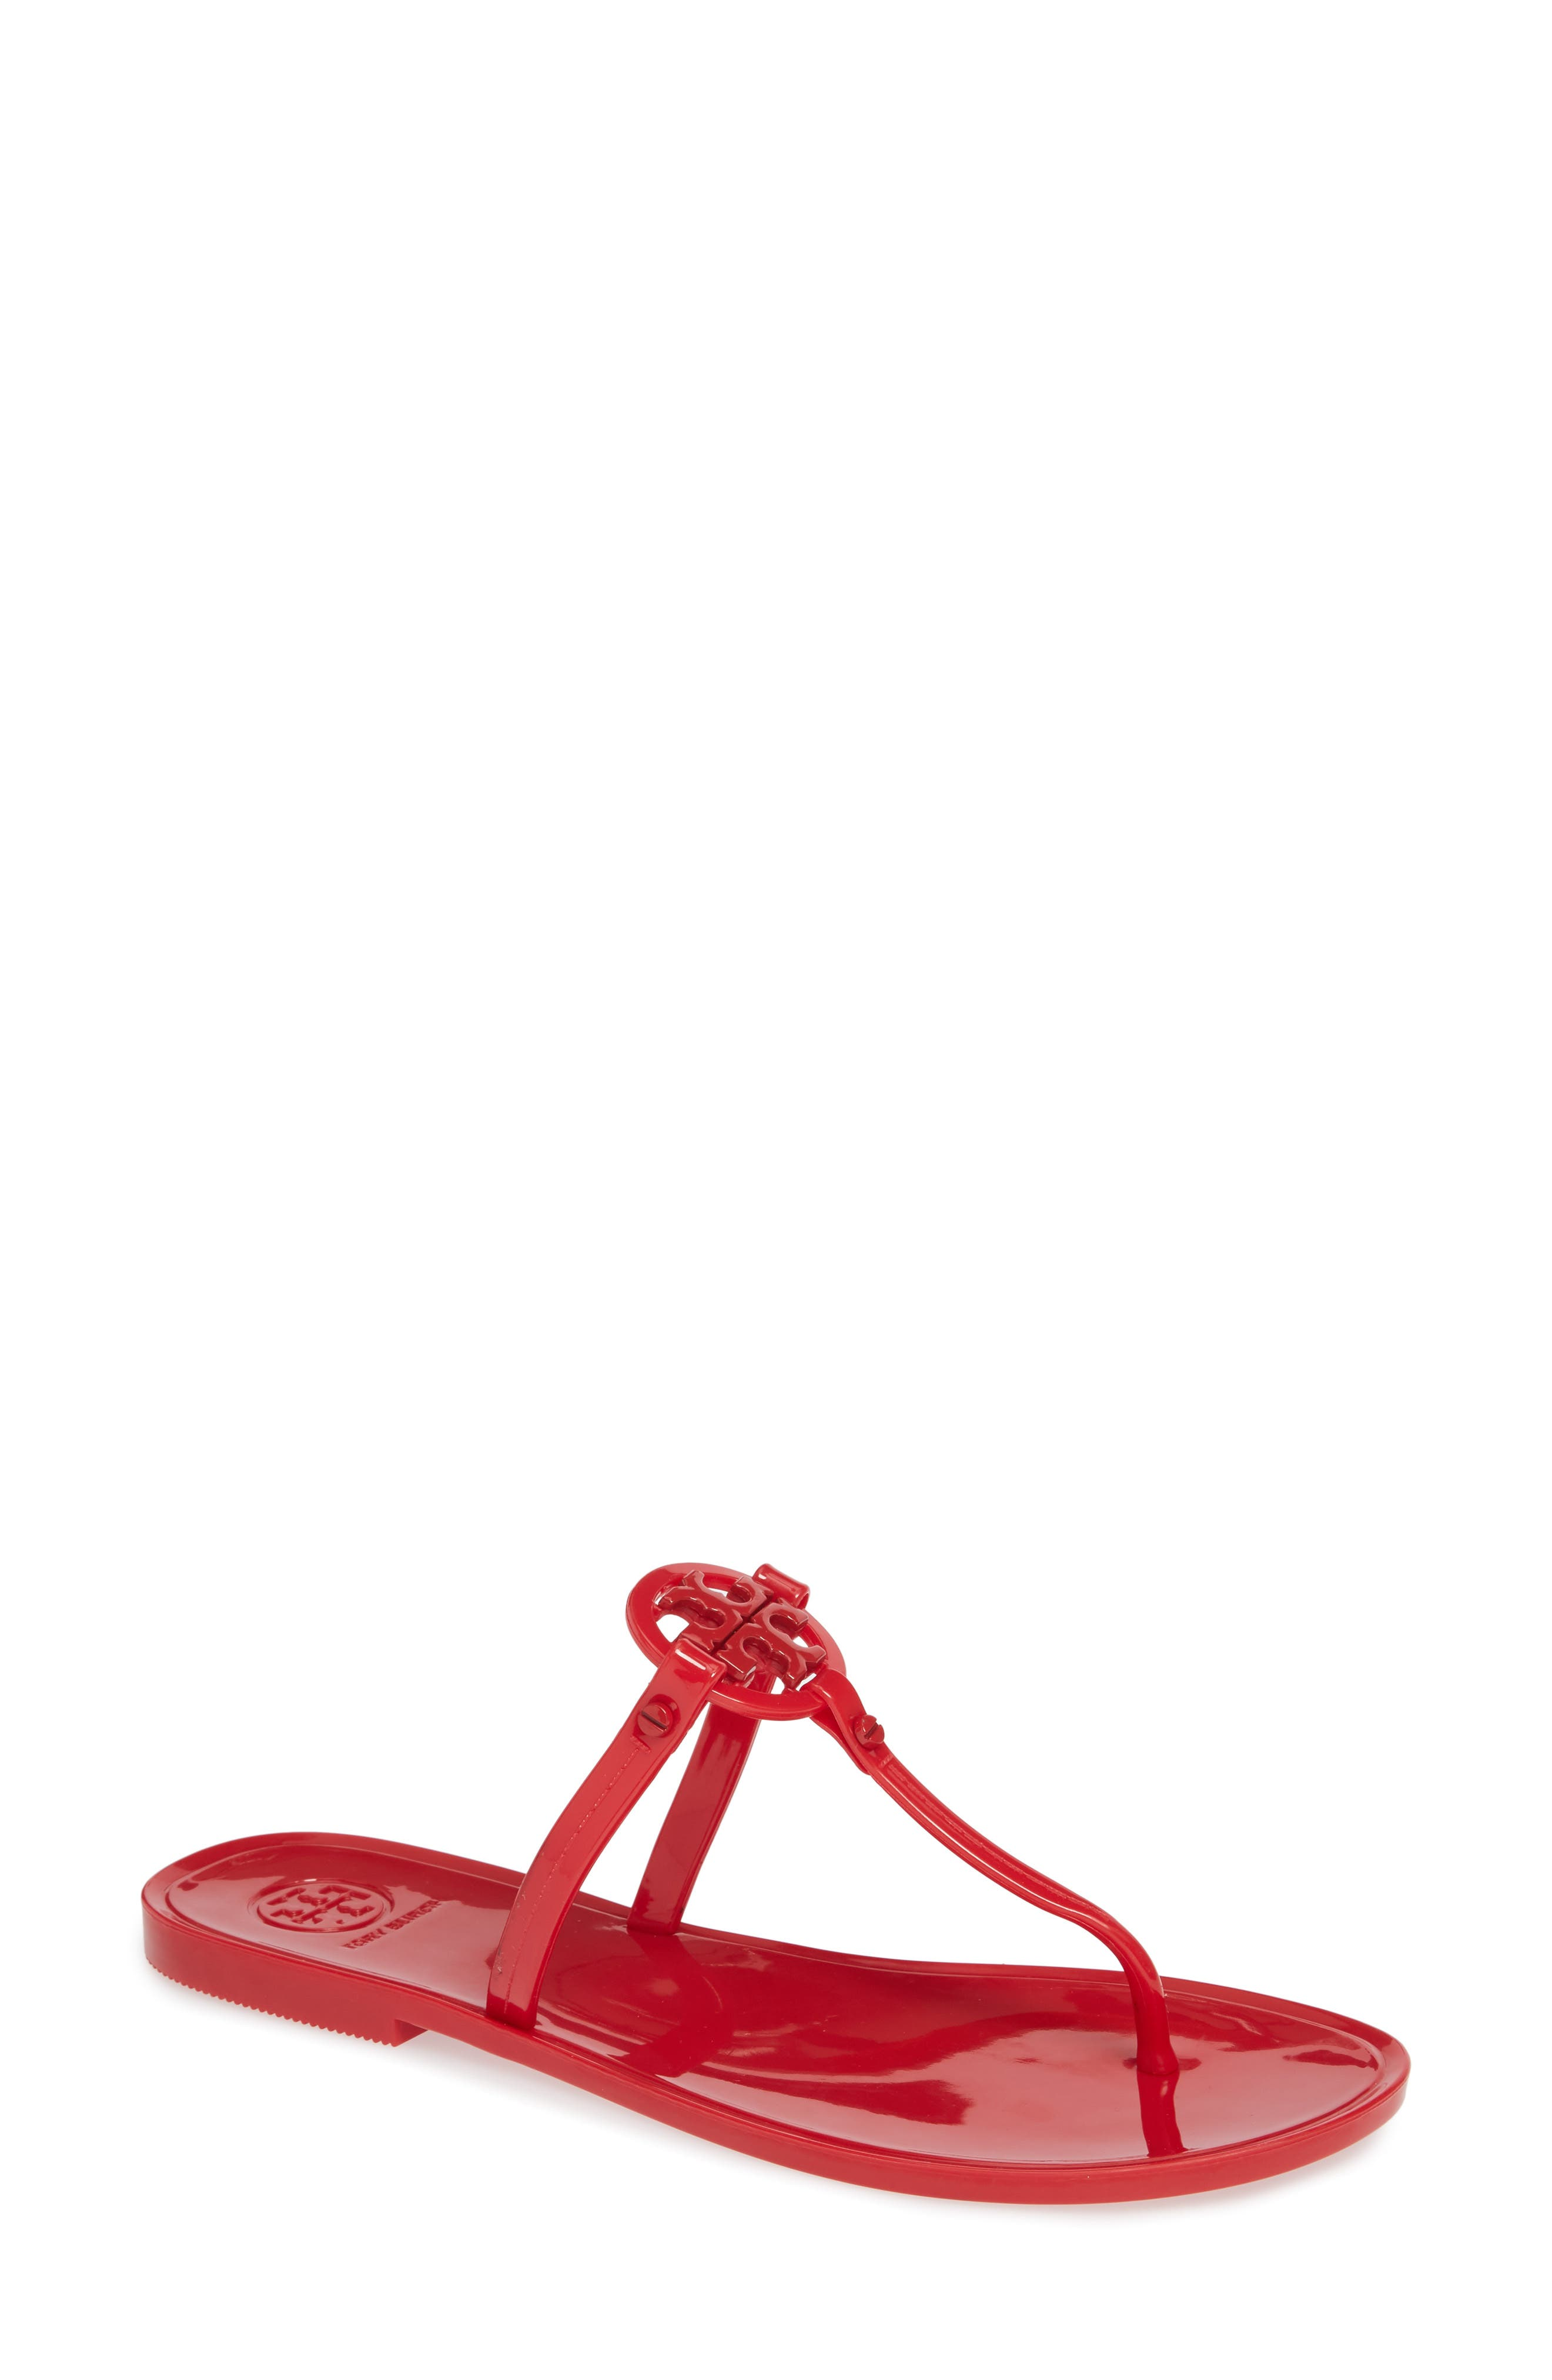 'Mini Miller' Flat Sandal,                         Main,                         color, BRILLIANT RED